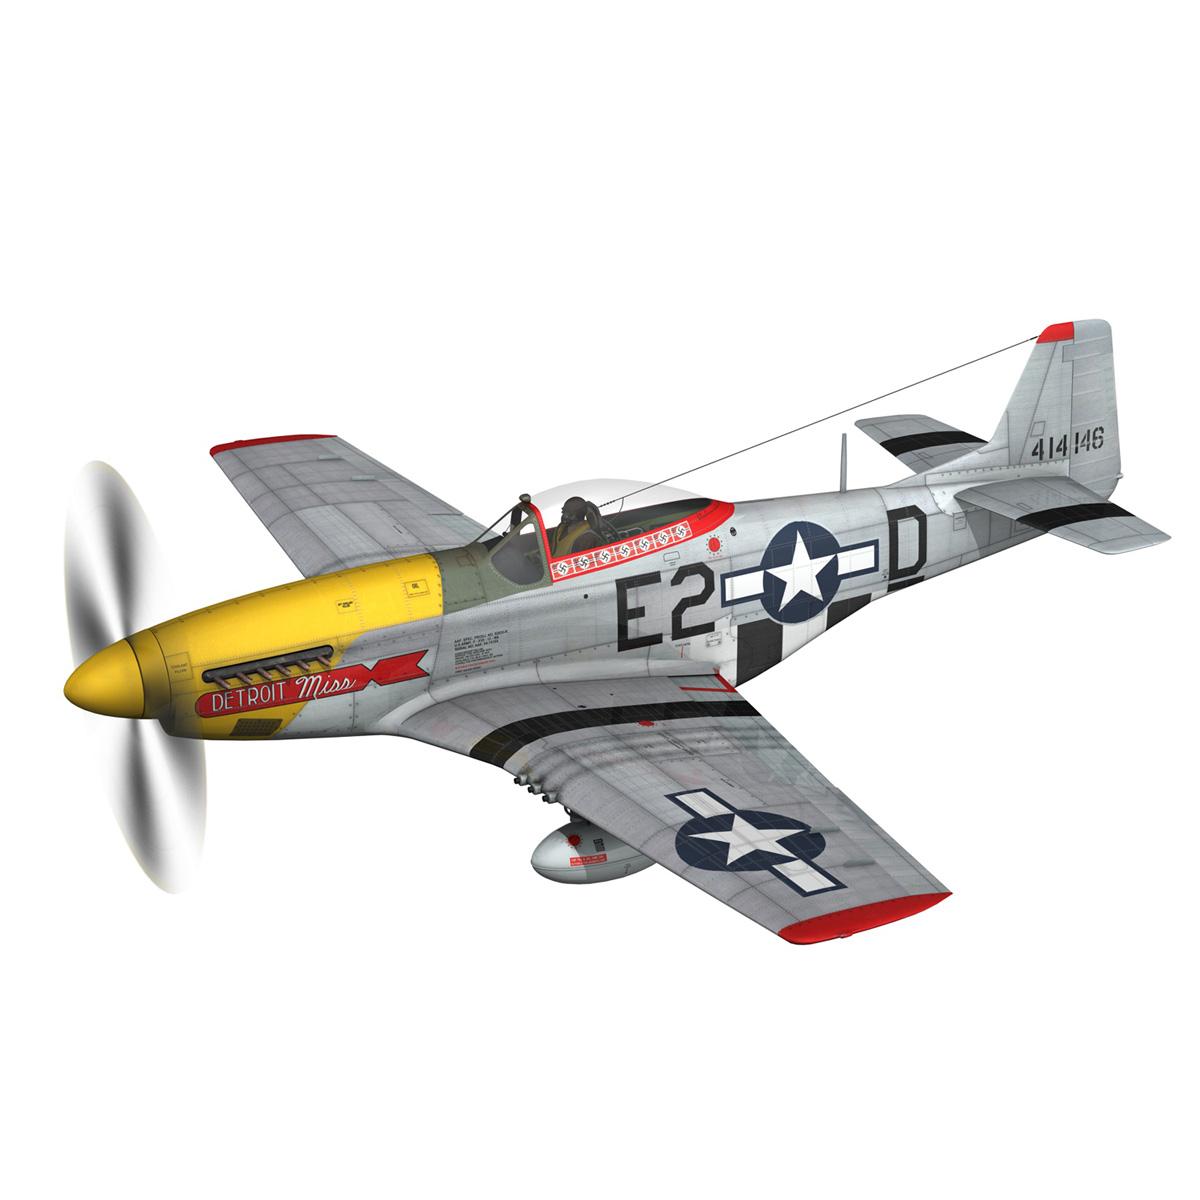 north american p-51d – mustang – detroit miss 3d model 3ds fbx c4d lwo obj 267594